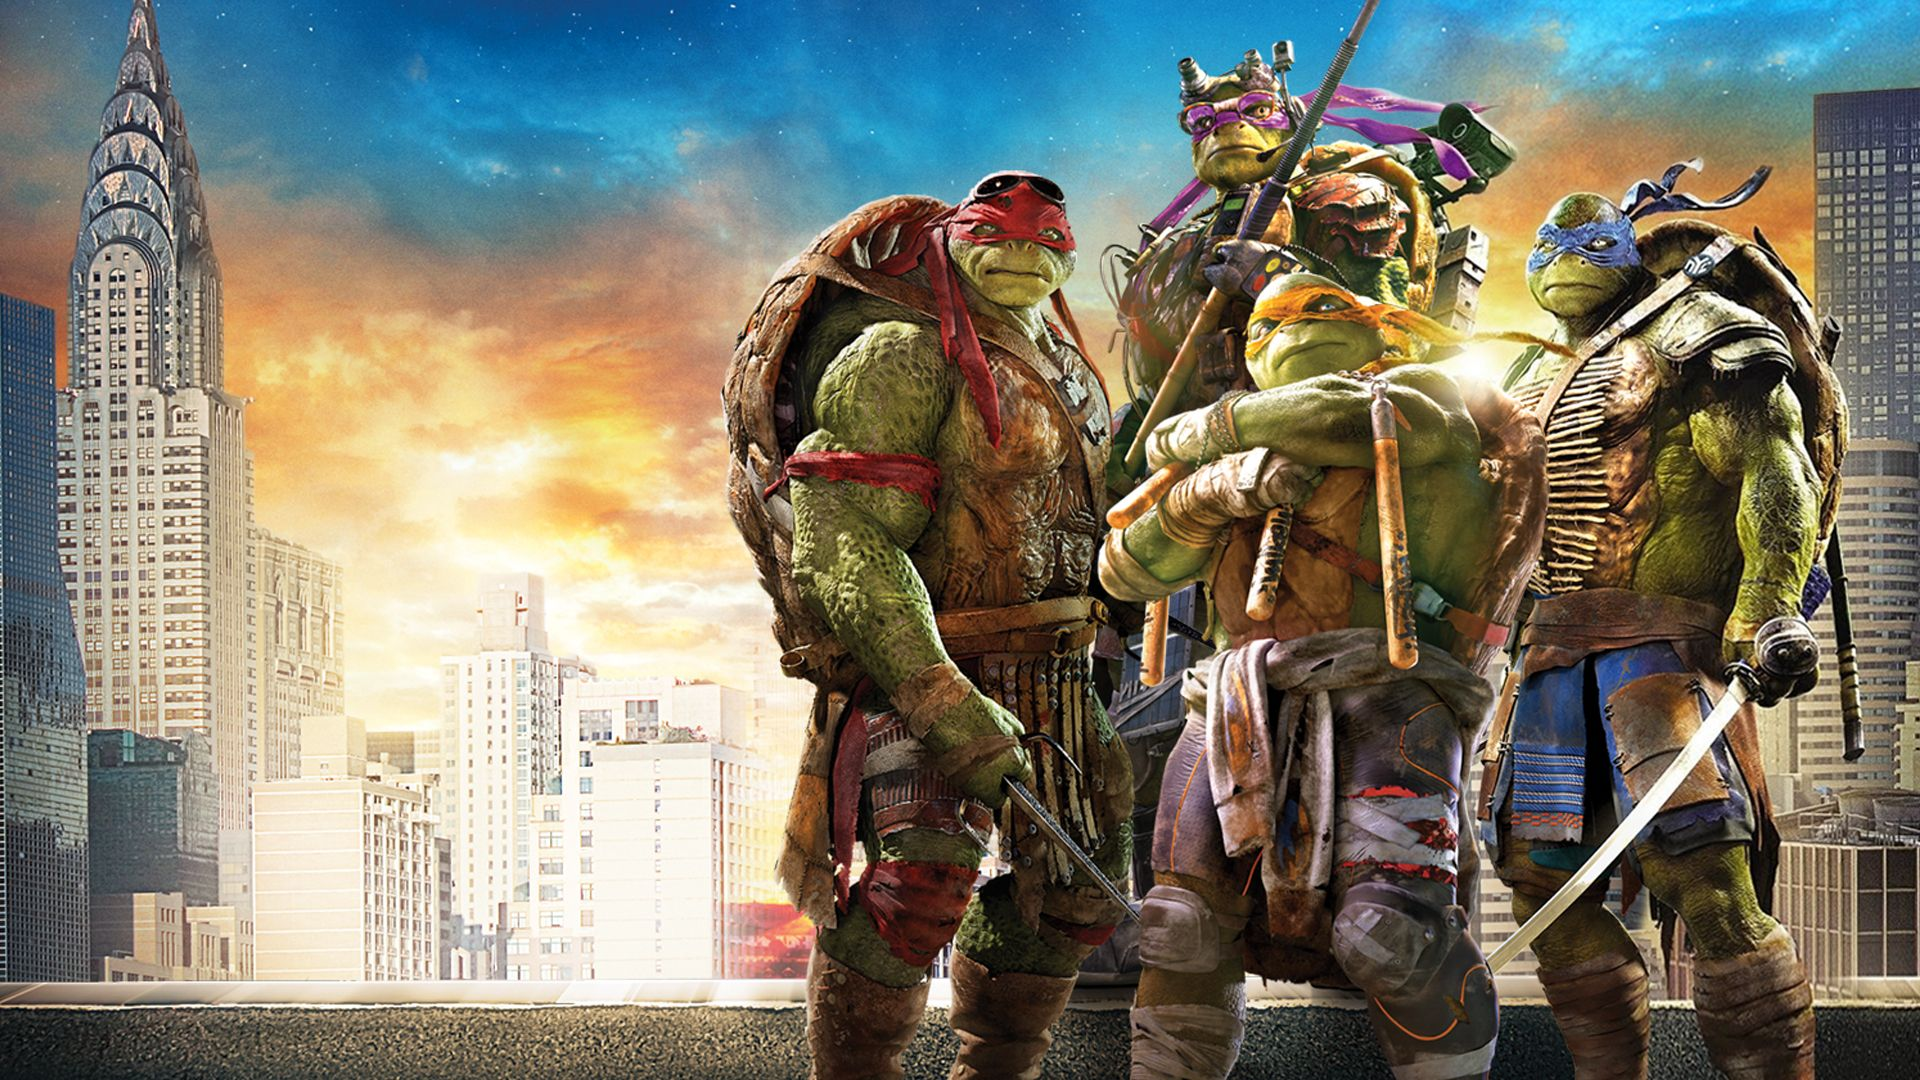 Ninja Turtles 2014 Wallpaper Google Search Mutante